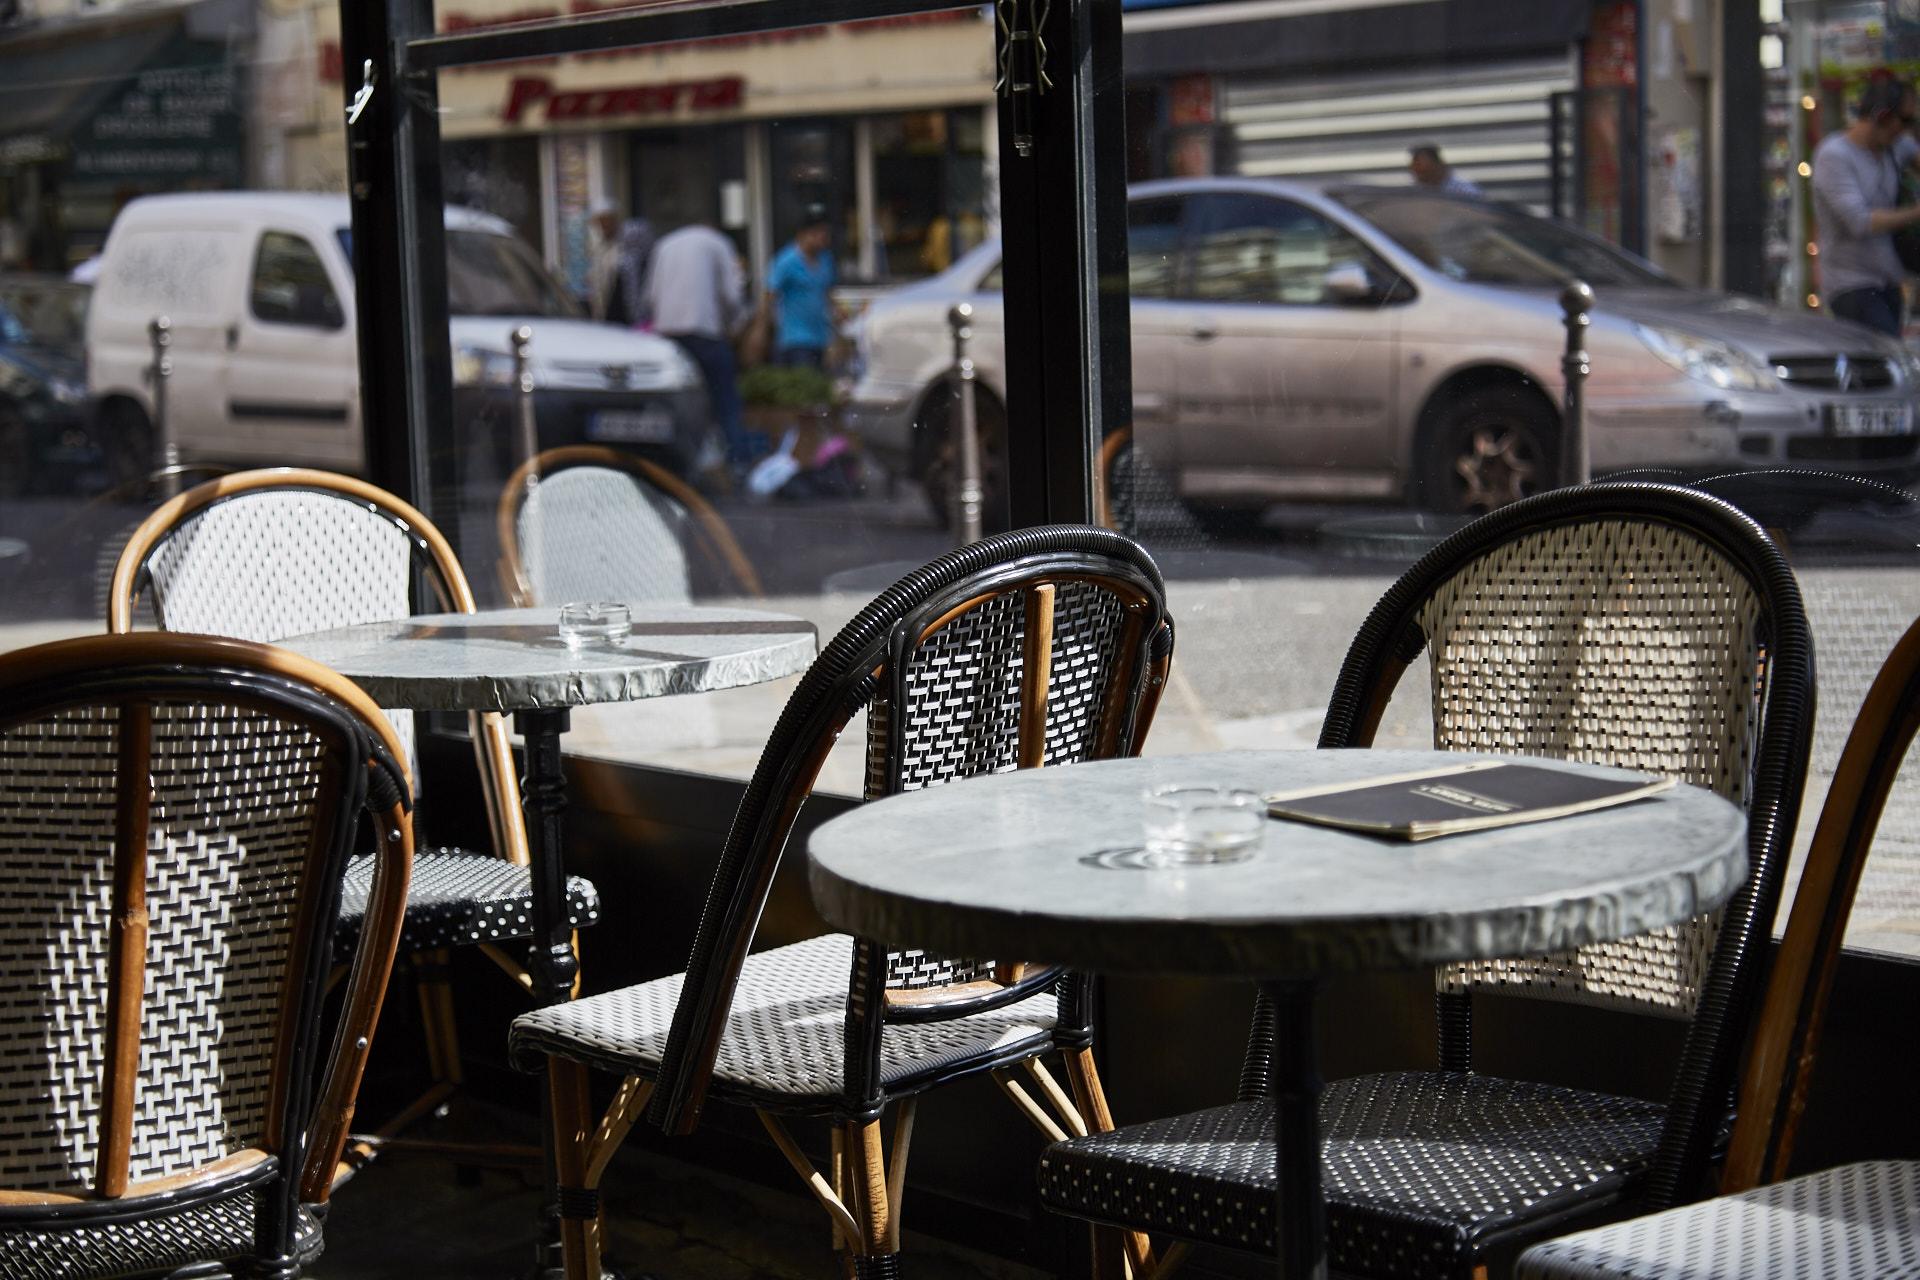 Terrasse L'Amour Vache Brasserie